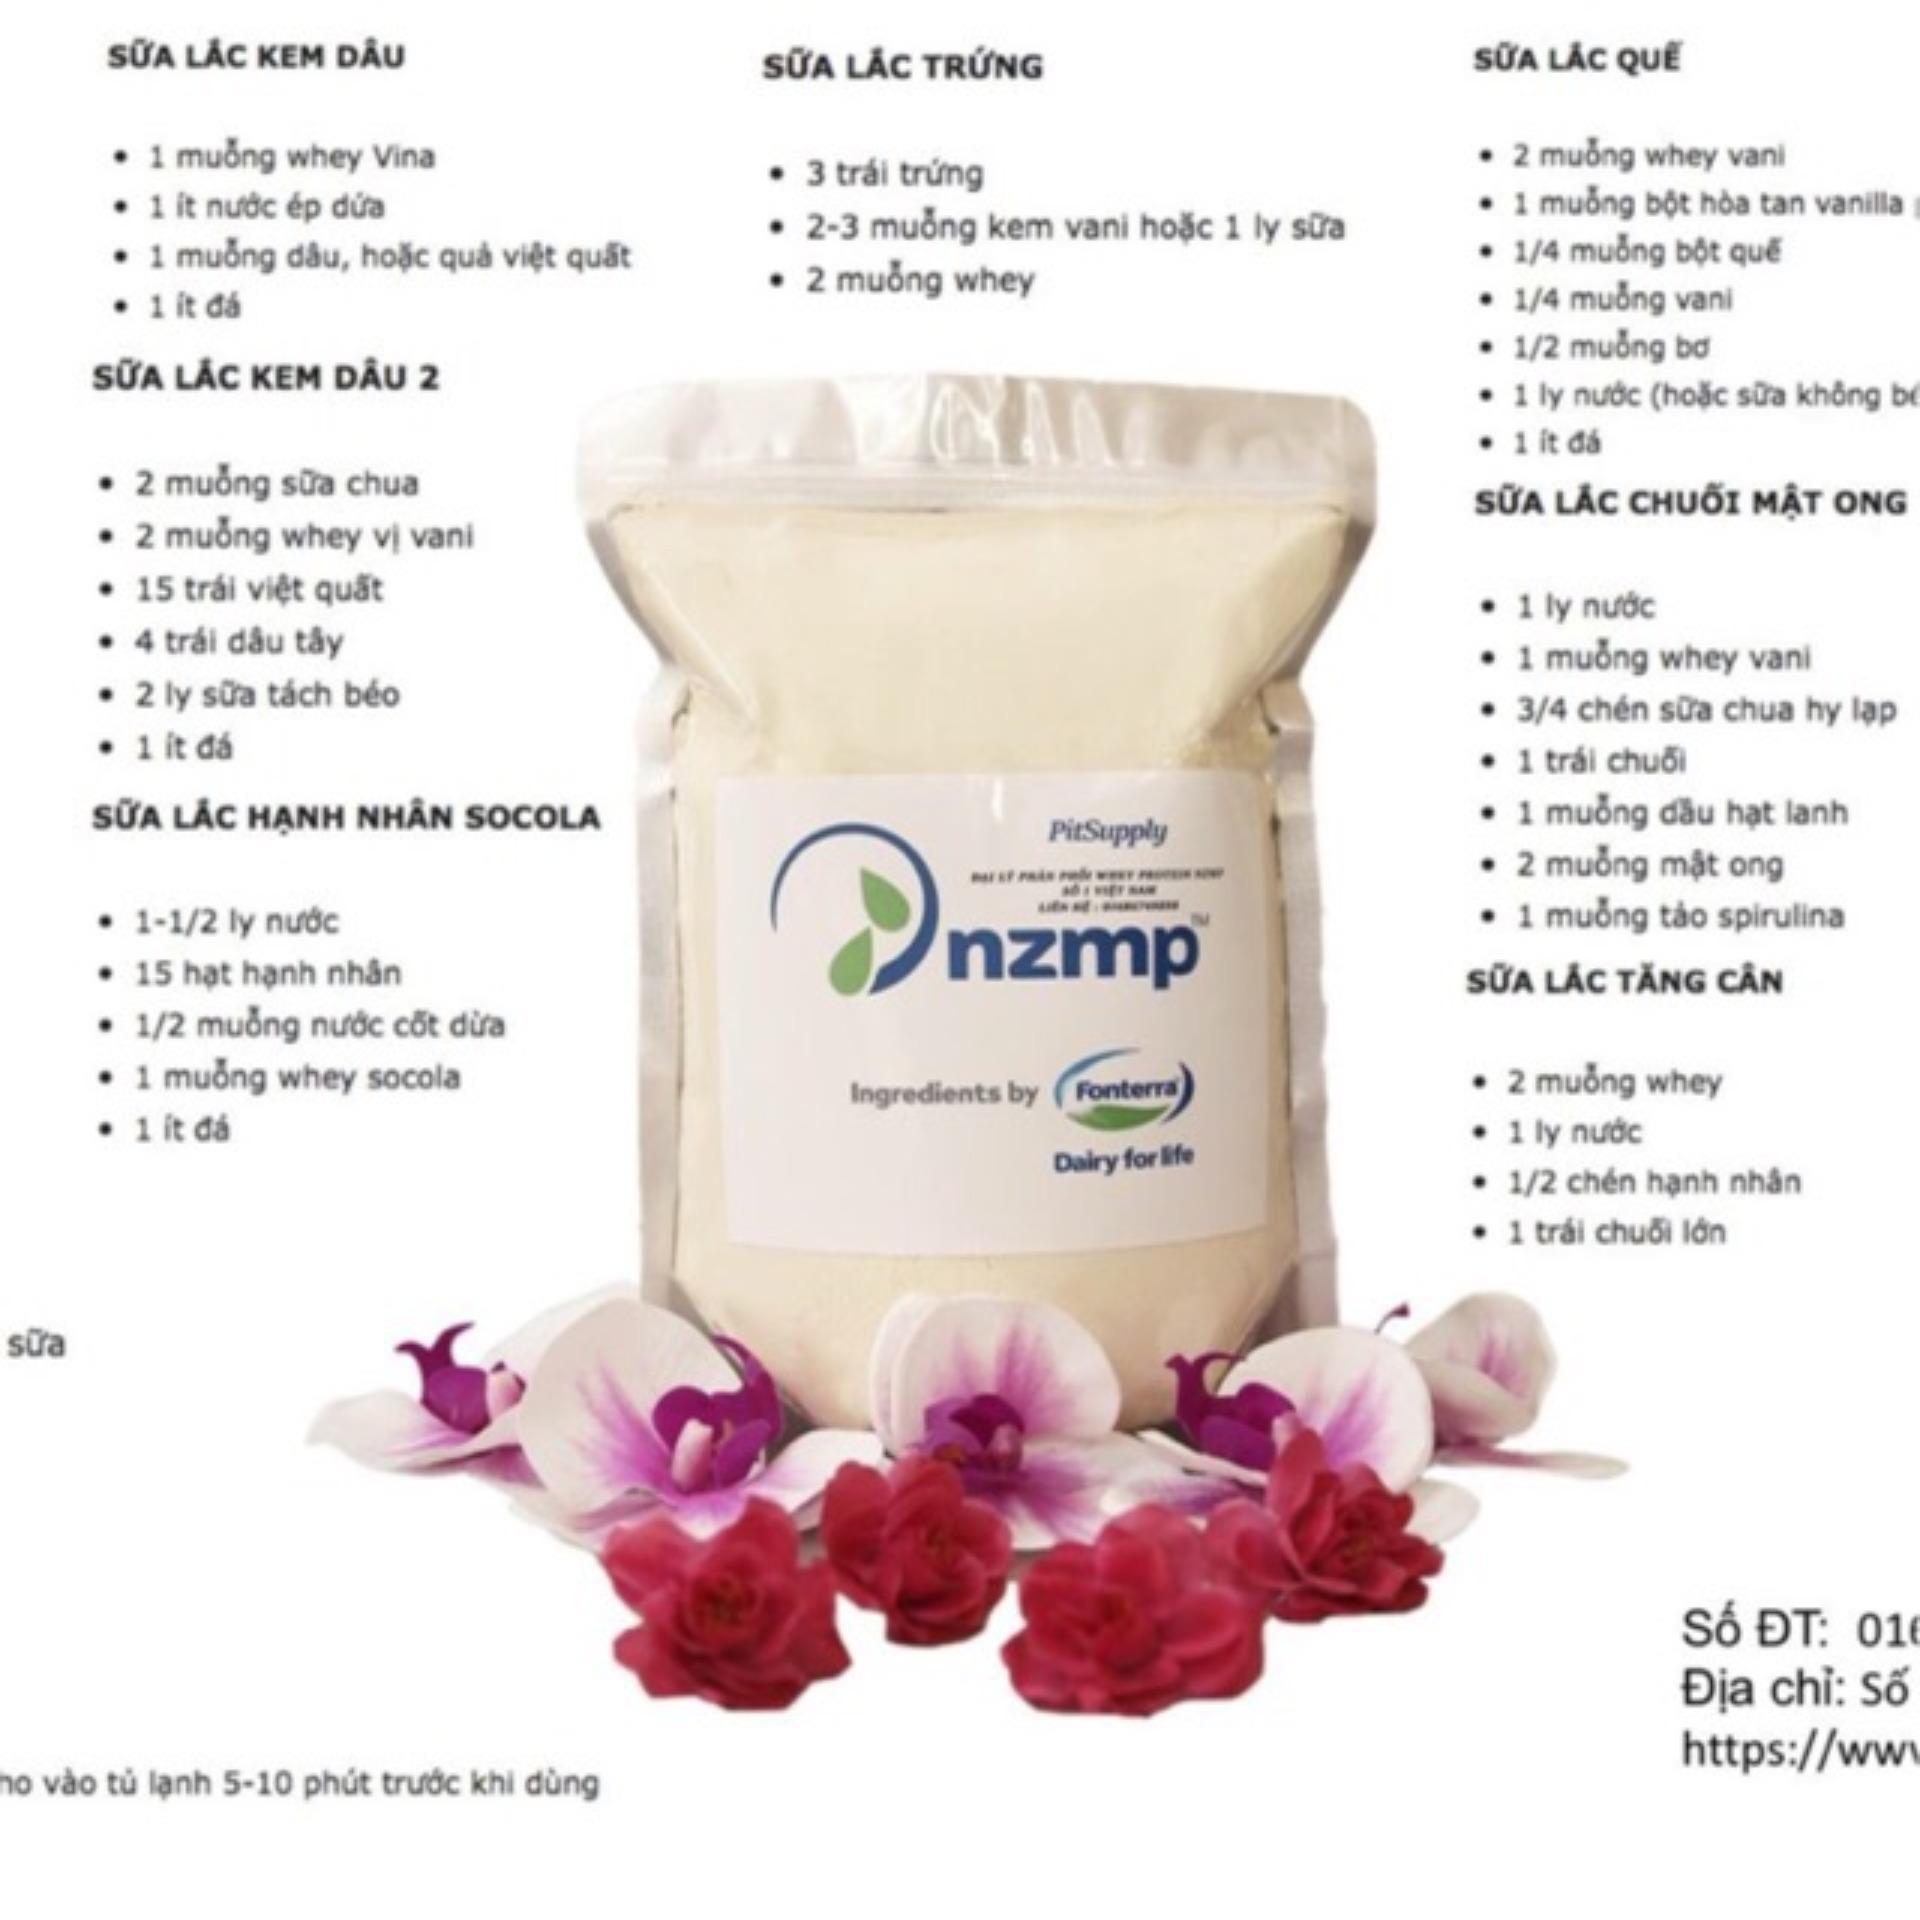 Whey Protein Concentrate 80% NZMP nhập khẩu